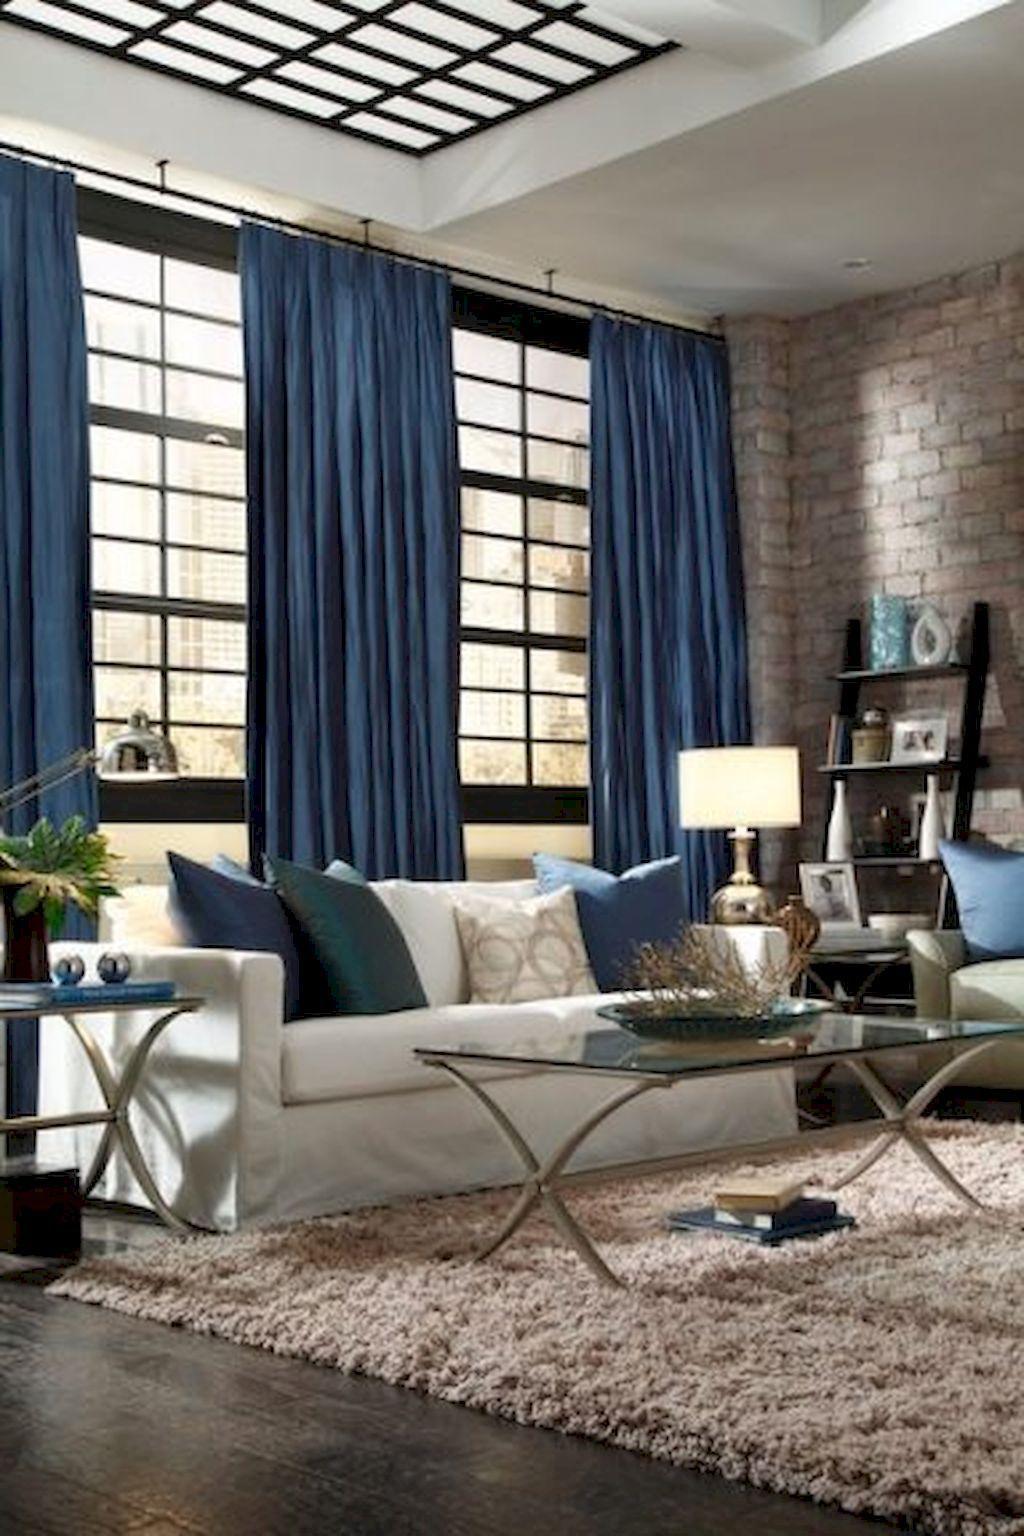 38 The Best Contemporary Living Room Decor Ideas Blue Curt